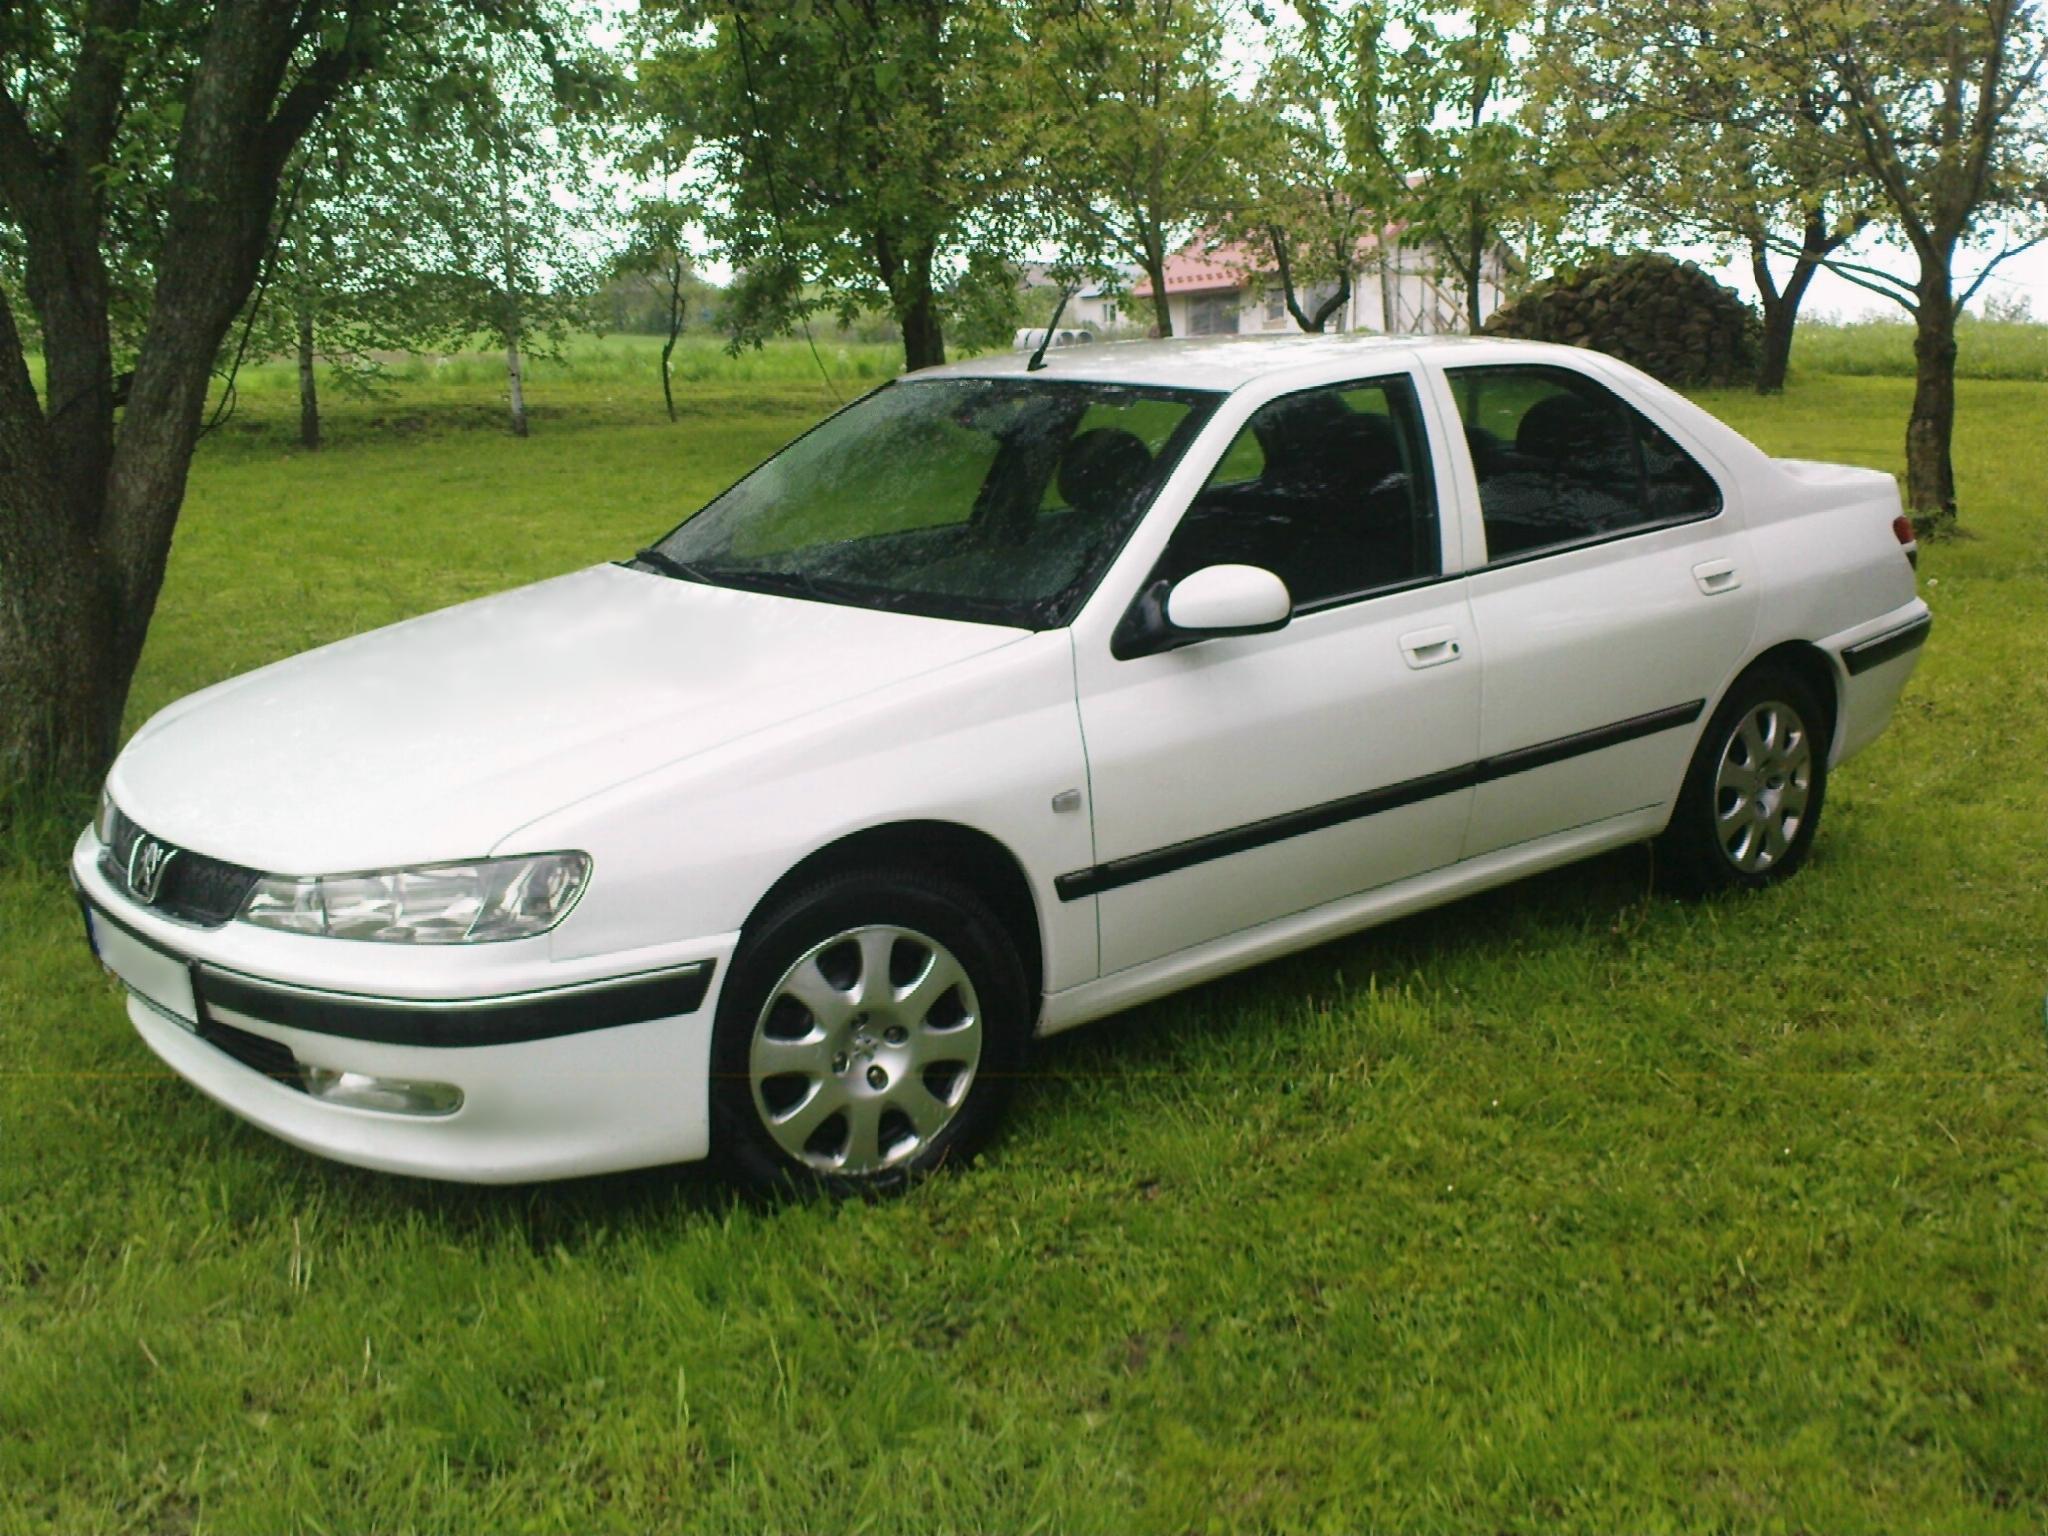 File:Peugeot 406 2003.jpg - Wikimedia Commons